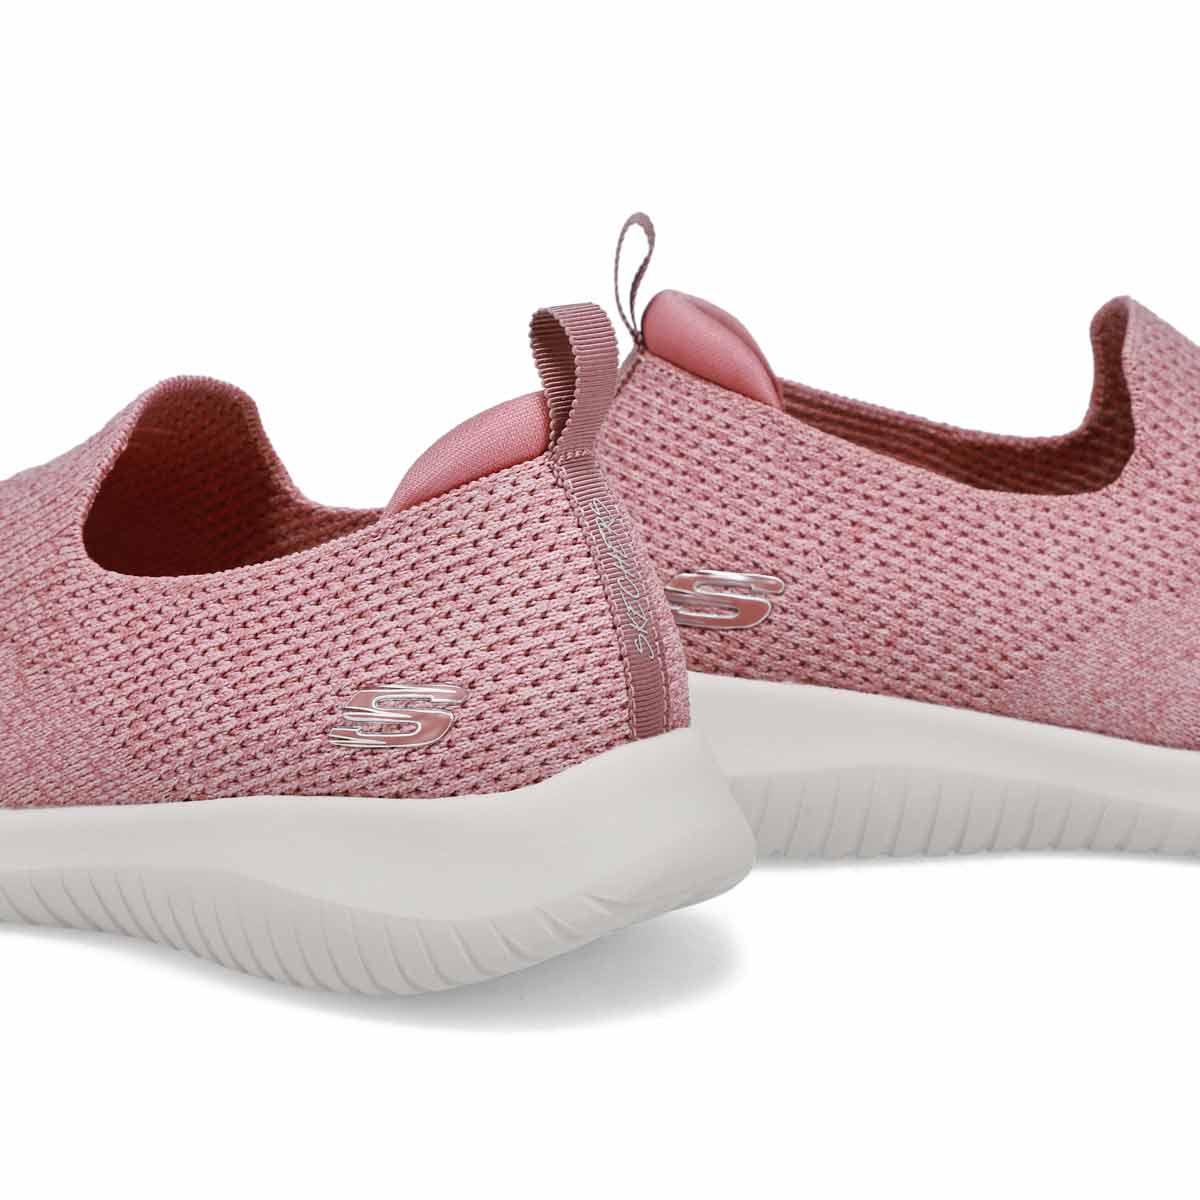 Women's Ultra Flex Harmonious Sneaker - Mauve